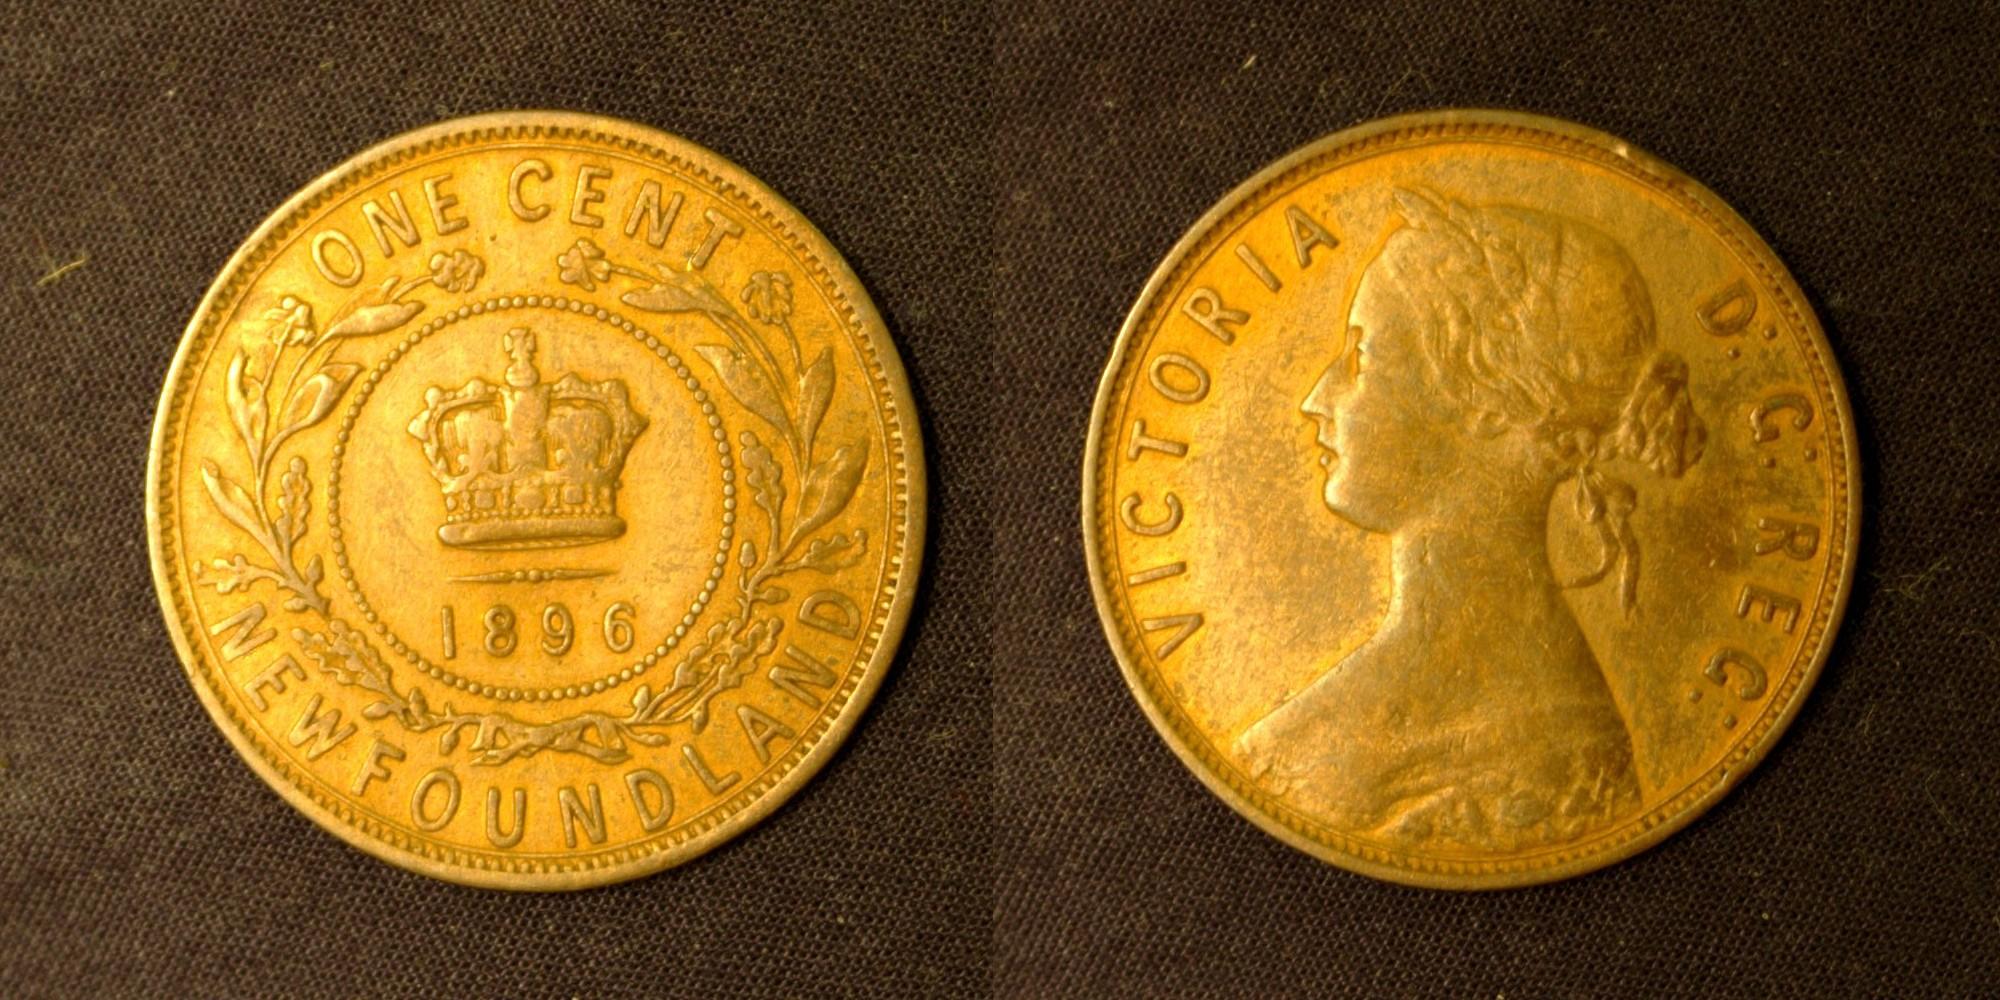 newfoundland-penny-1896